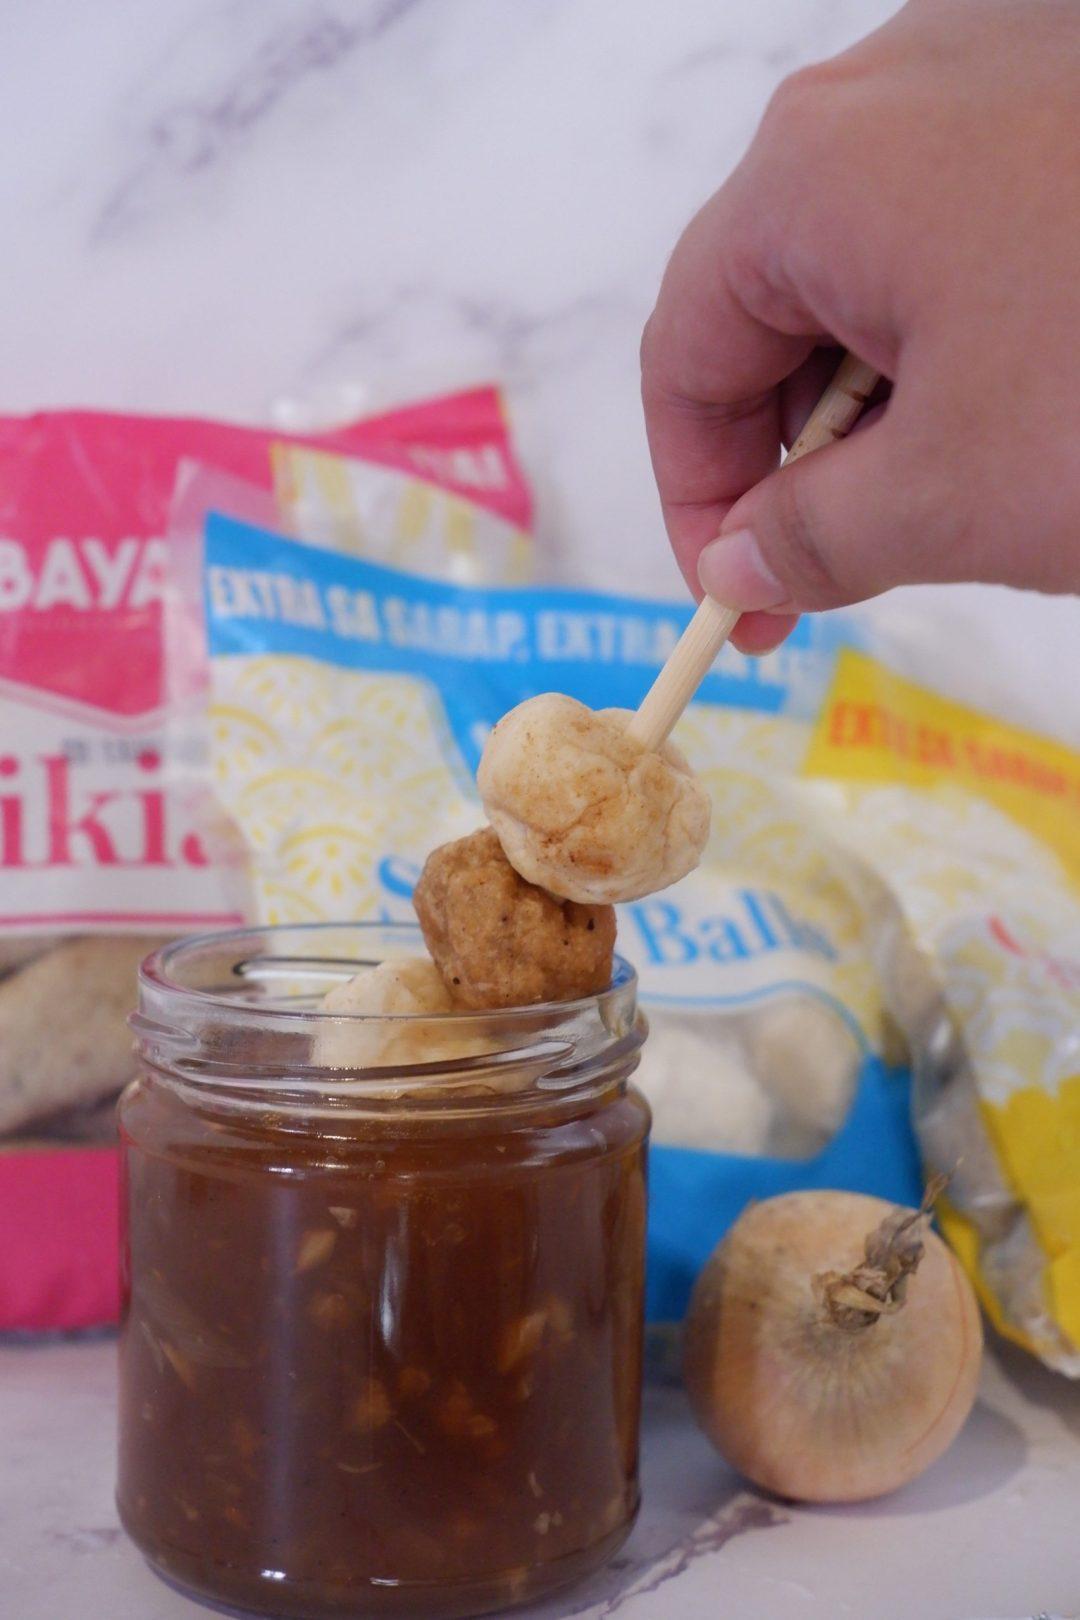 Bayani Street Food Feast at Home